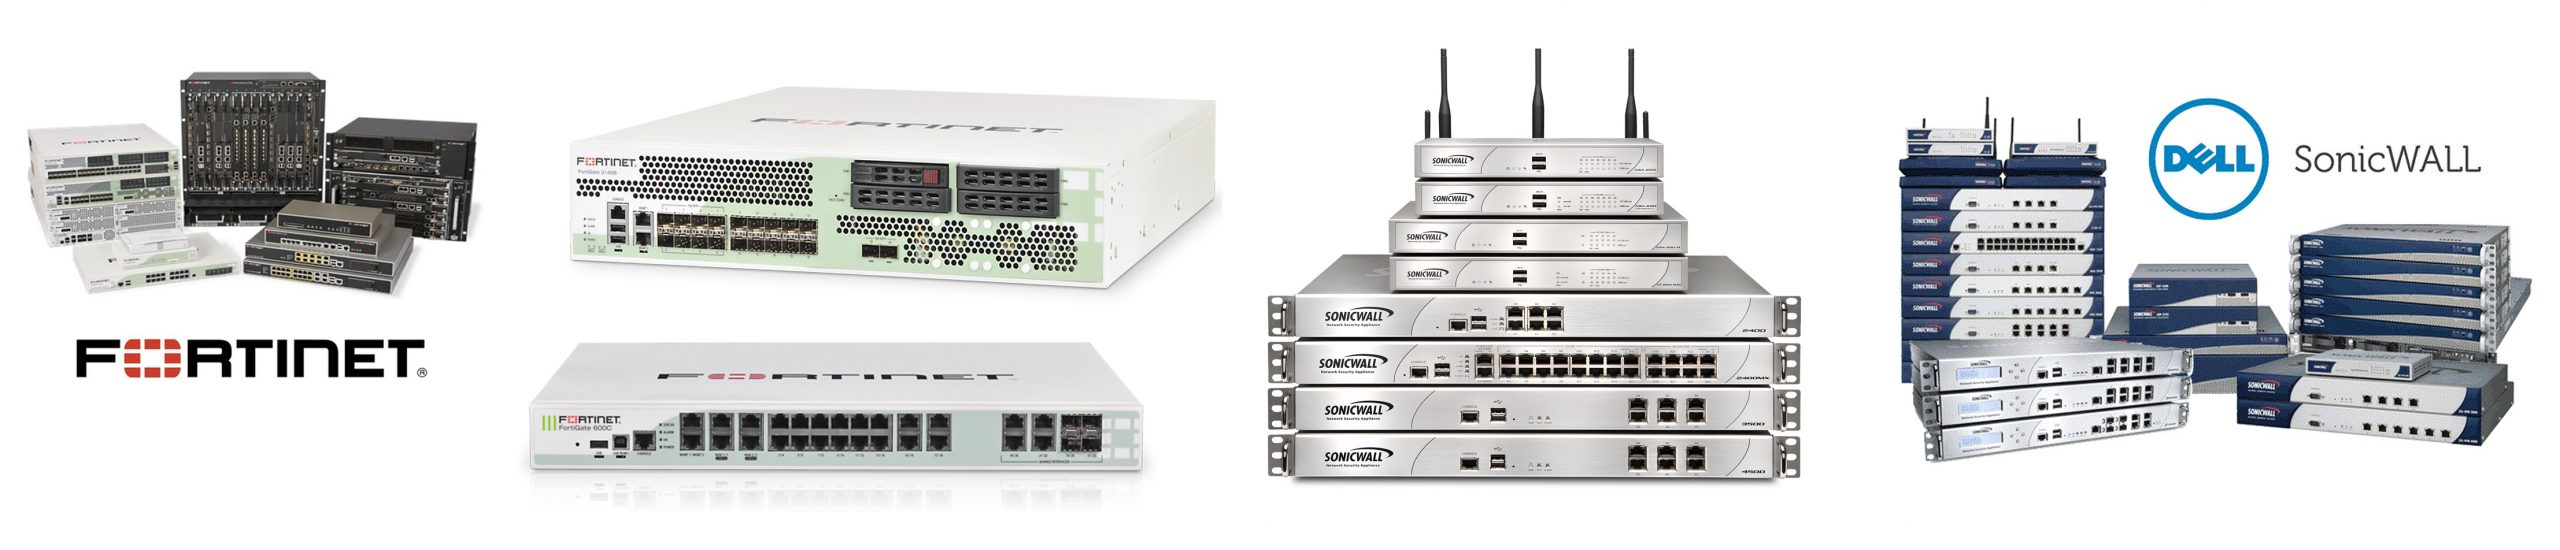 Firewall, Log ve Hot Spot Çözümleri